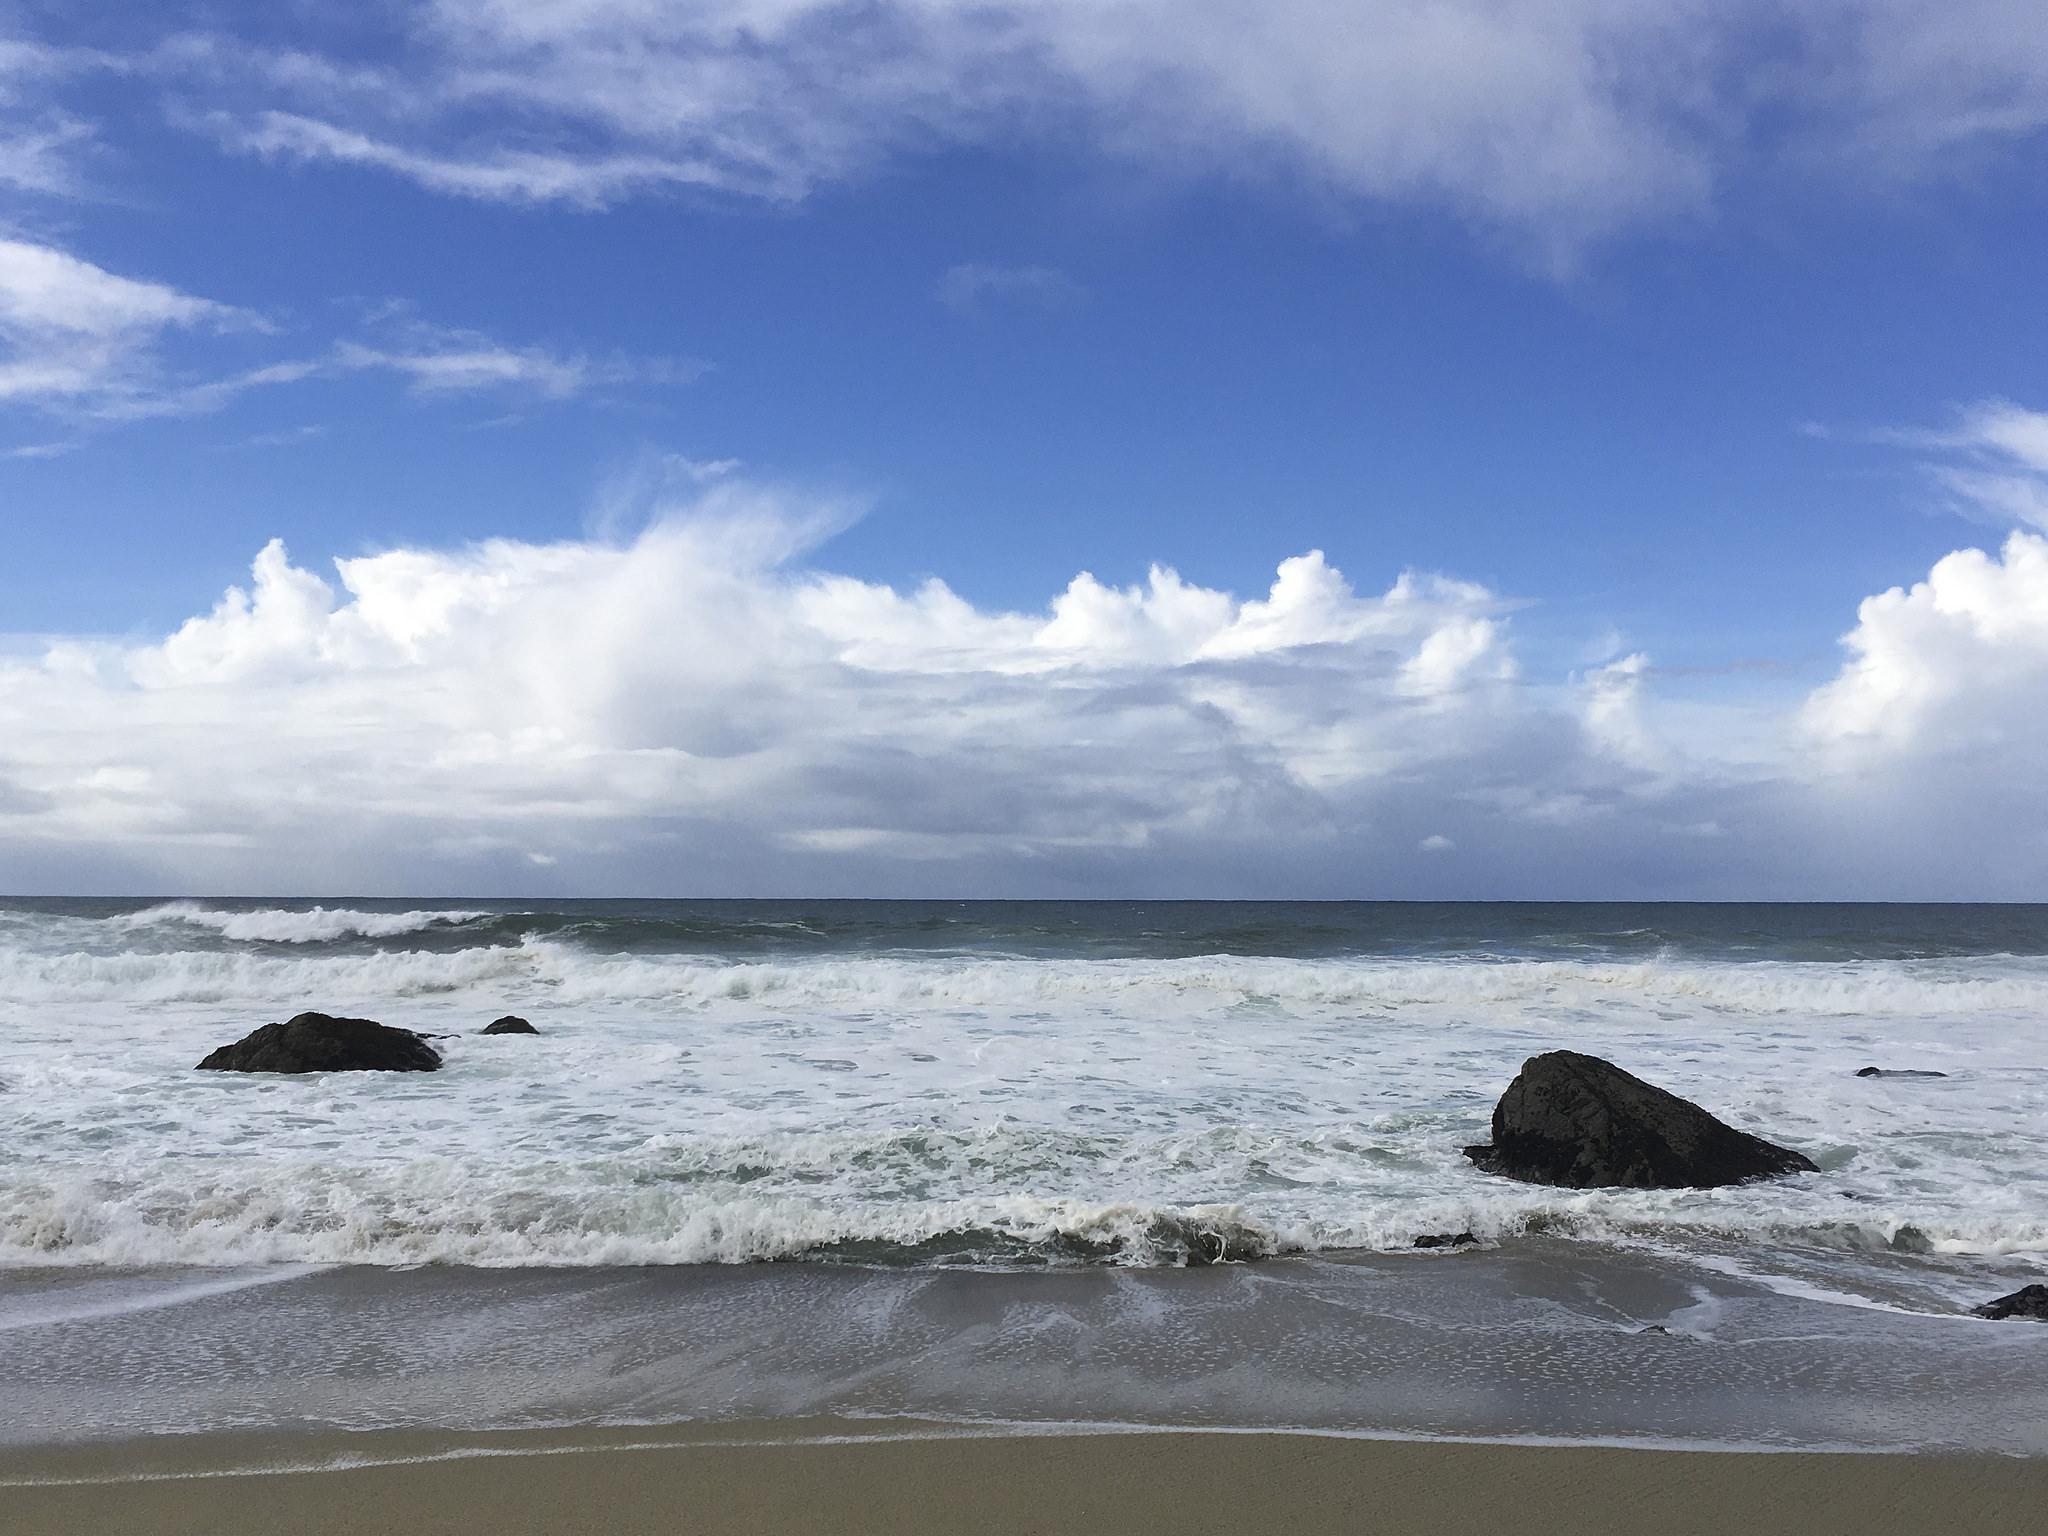 The Pacific Ocean is seen from Bodega Bay, Calif., Saturday, Nov. 26, 2016.